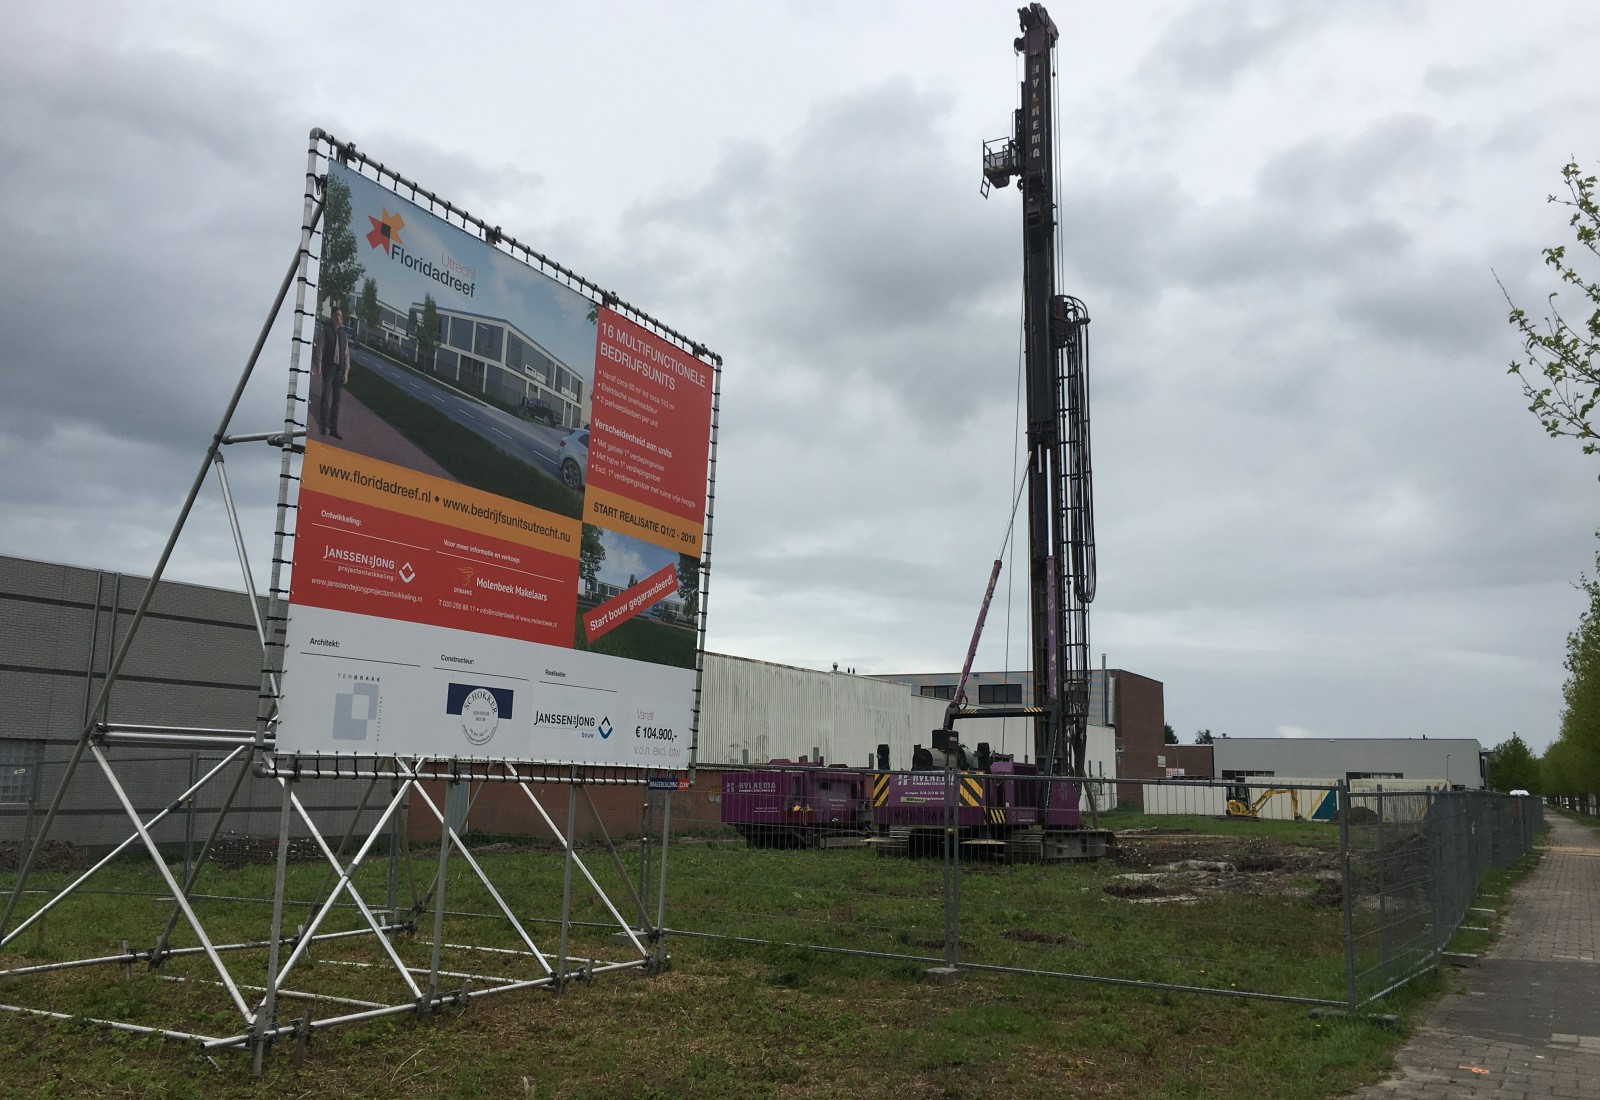 Thumbnail for Bouw bedrijfshuisvesting Floridadreef Utrecht gestart